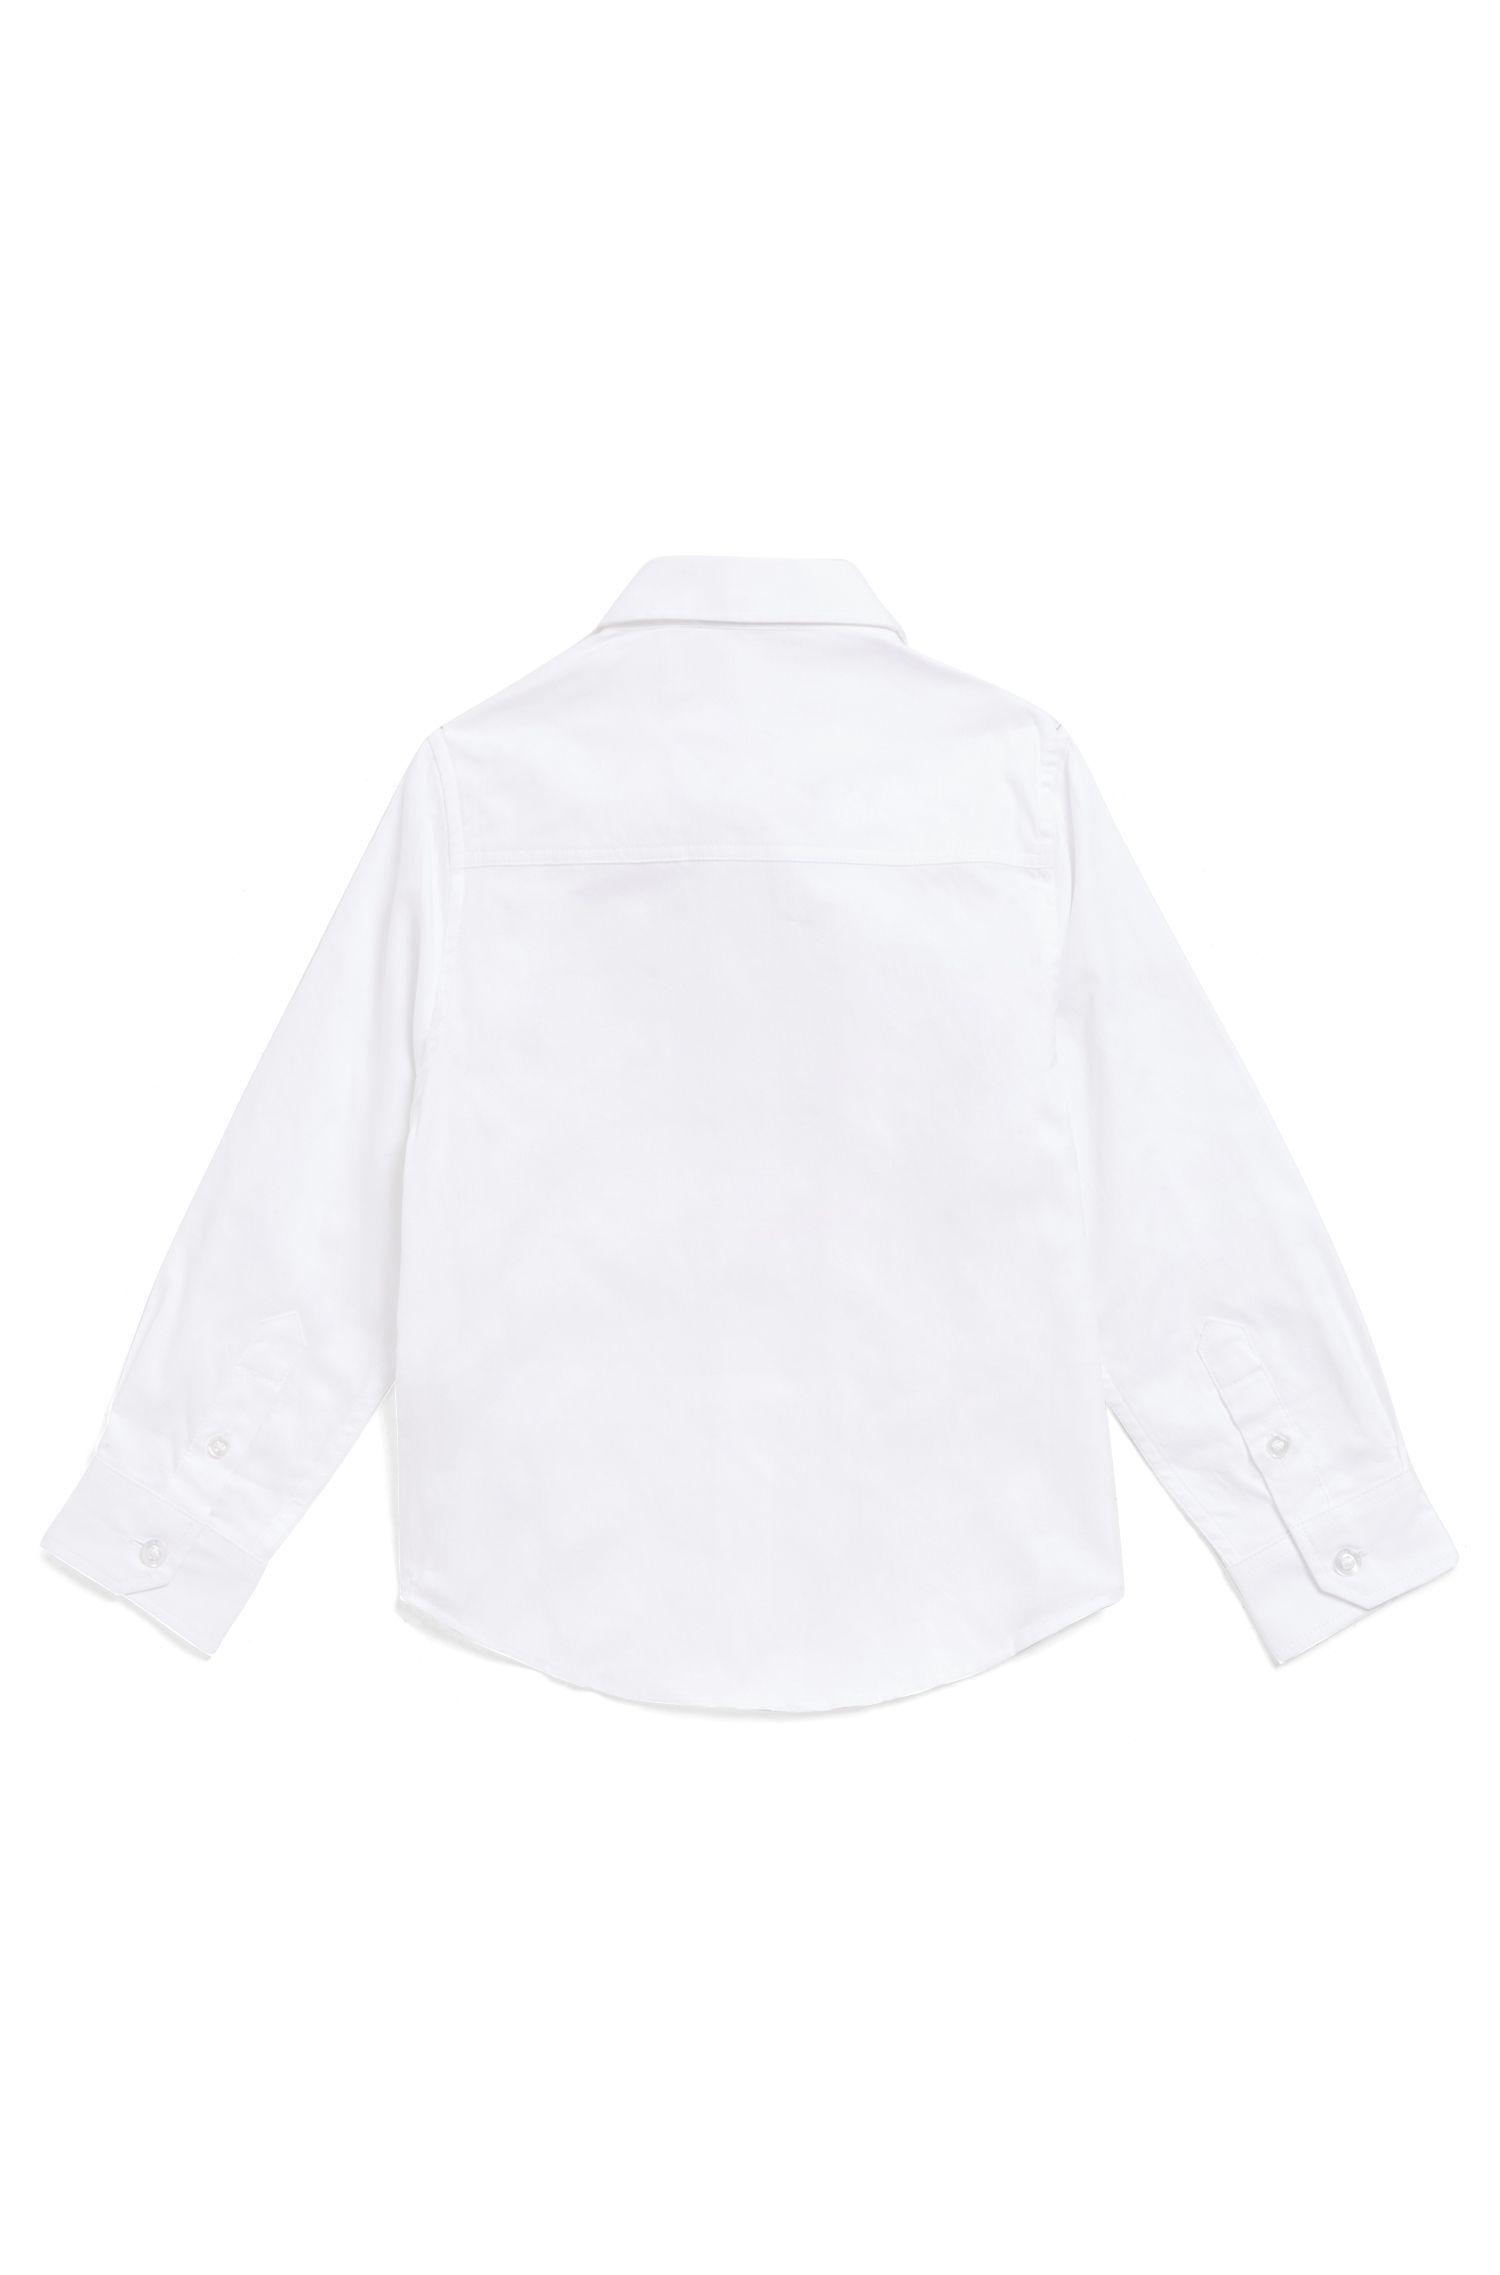 Camisa de manga larga para niños con logo bordado, Blanco